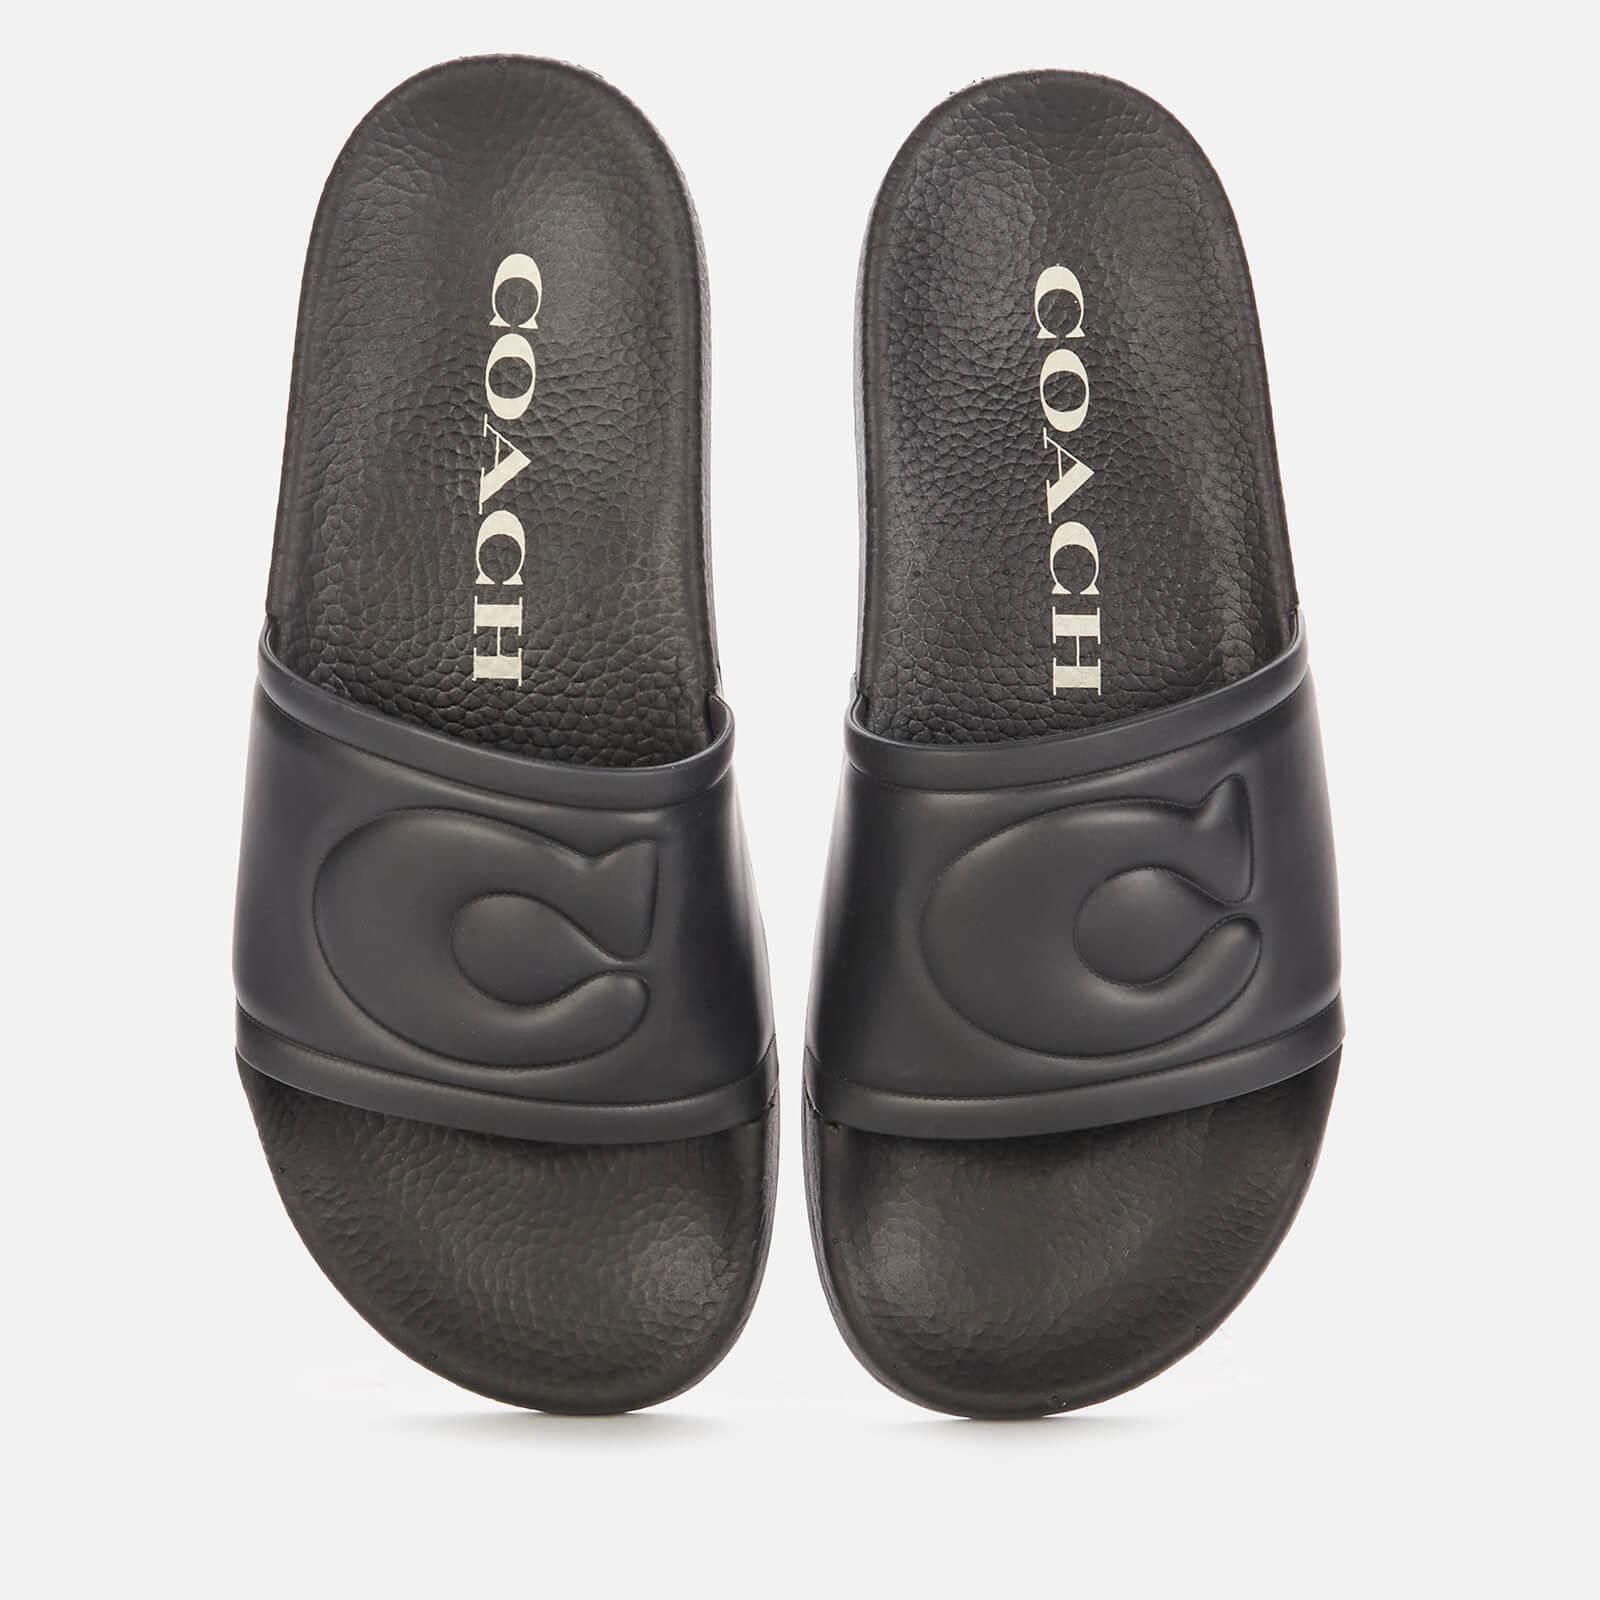 Coach Women's Ula Rubber Slide Sandals - Black - Uk 3